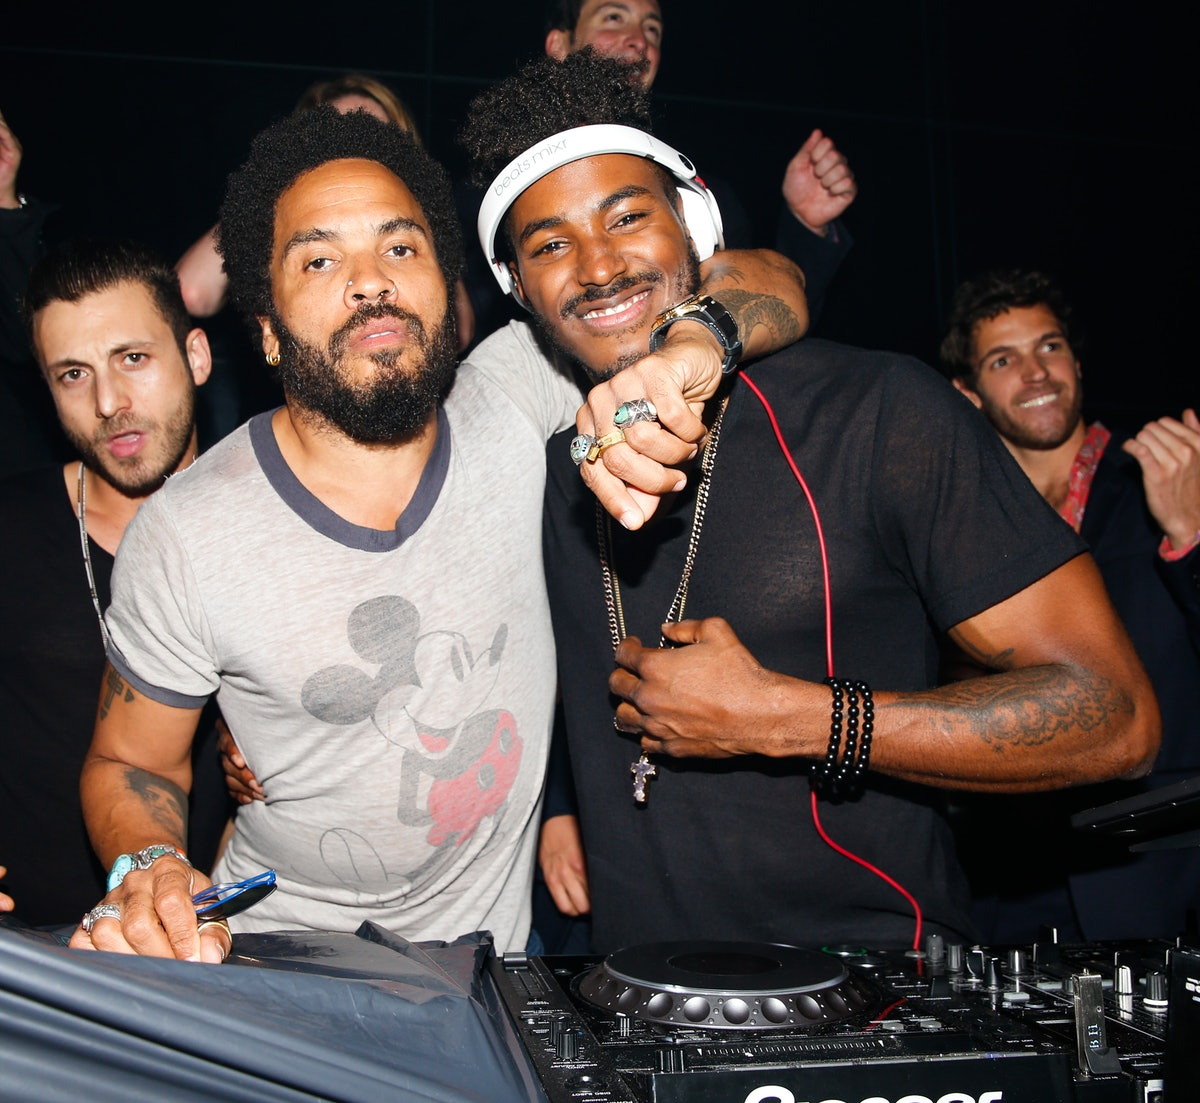 Lenny Kravitz and DJ Ruckus